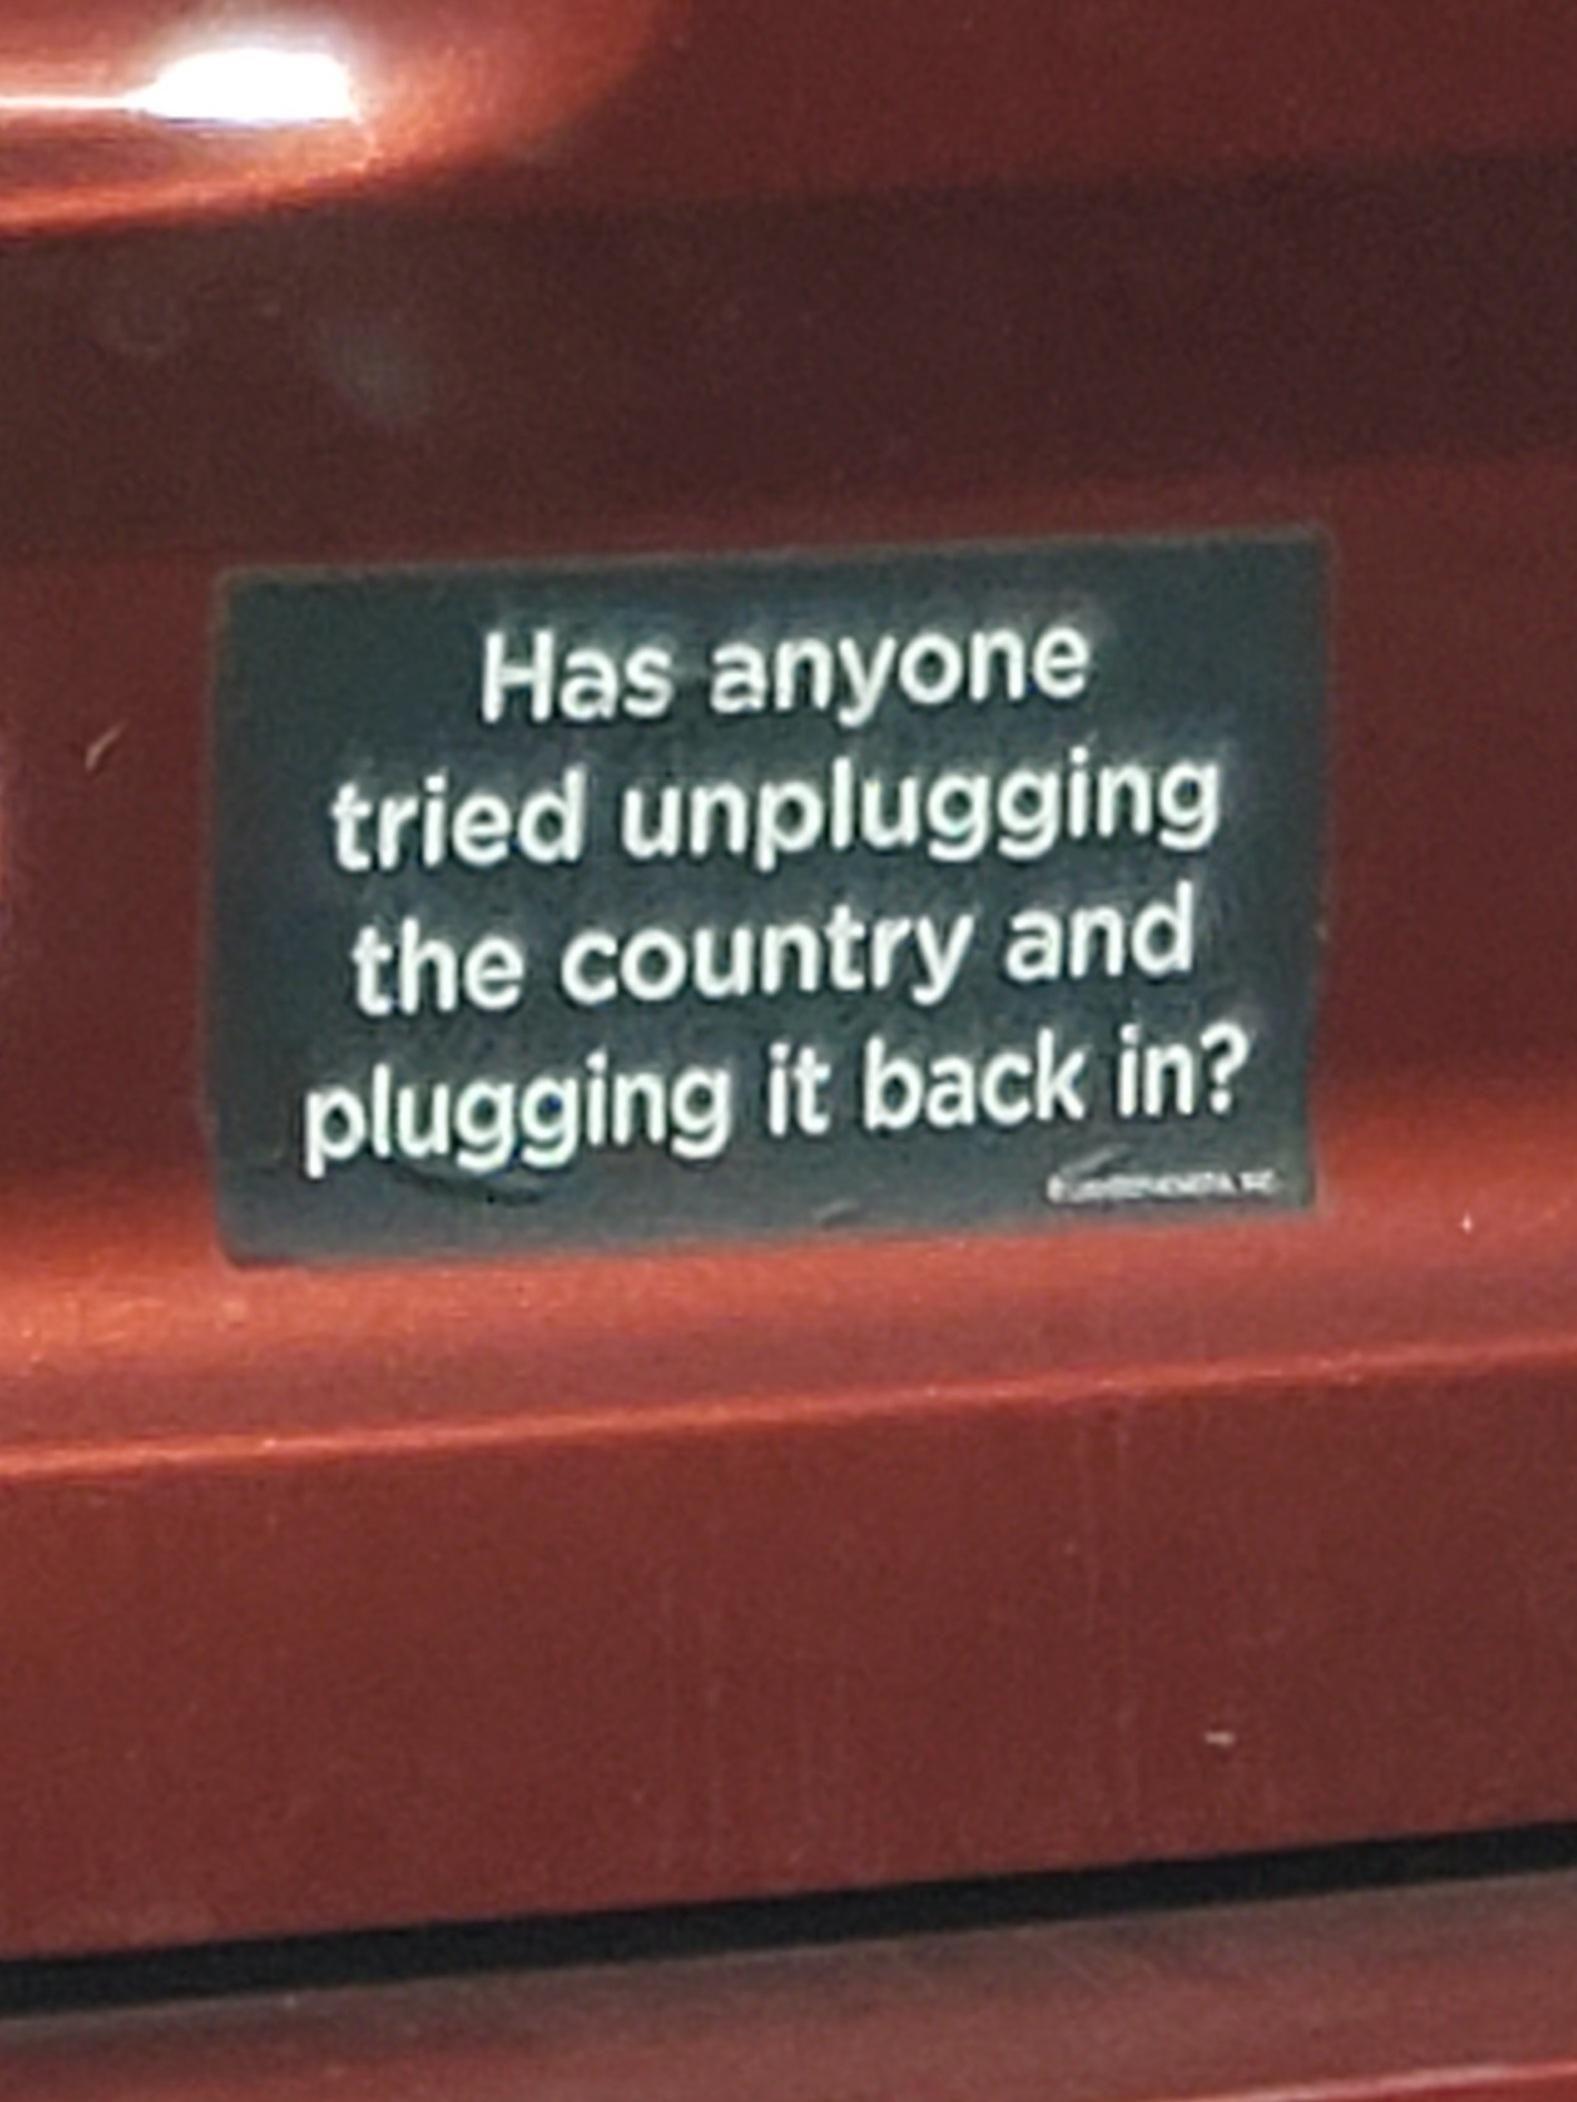 This bumper sticker I saw.